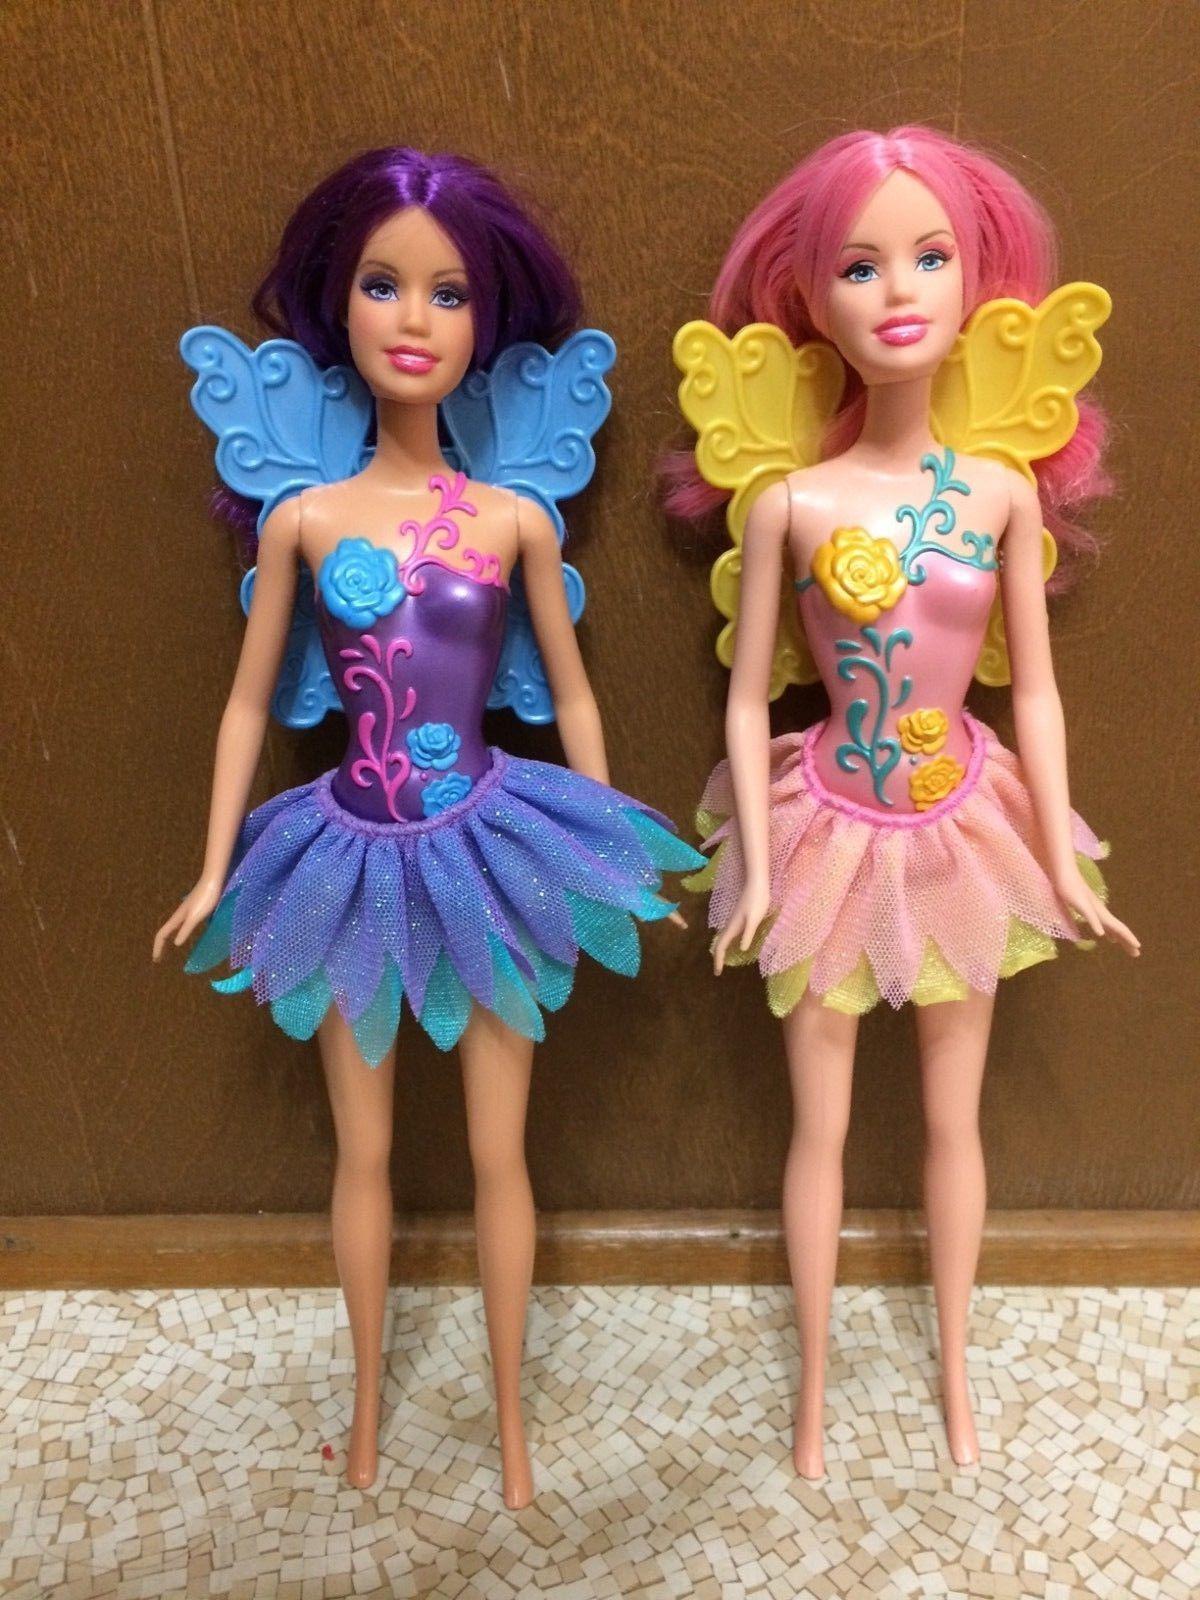 Find great deals on ebay for barbie hair extensions doll barbie light - Pink Purple Hair Fairy Fairytopia Mermaidia Barbie Doll Flower Body Tutu Wings Ebay